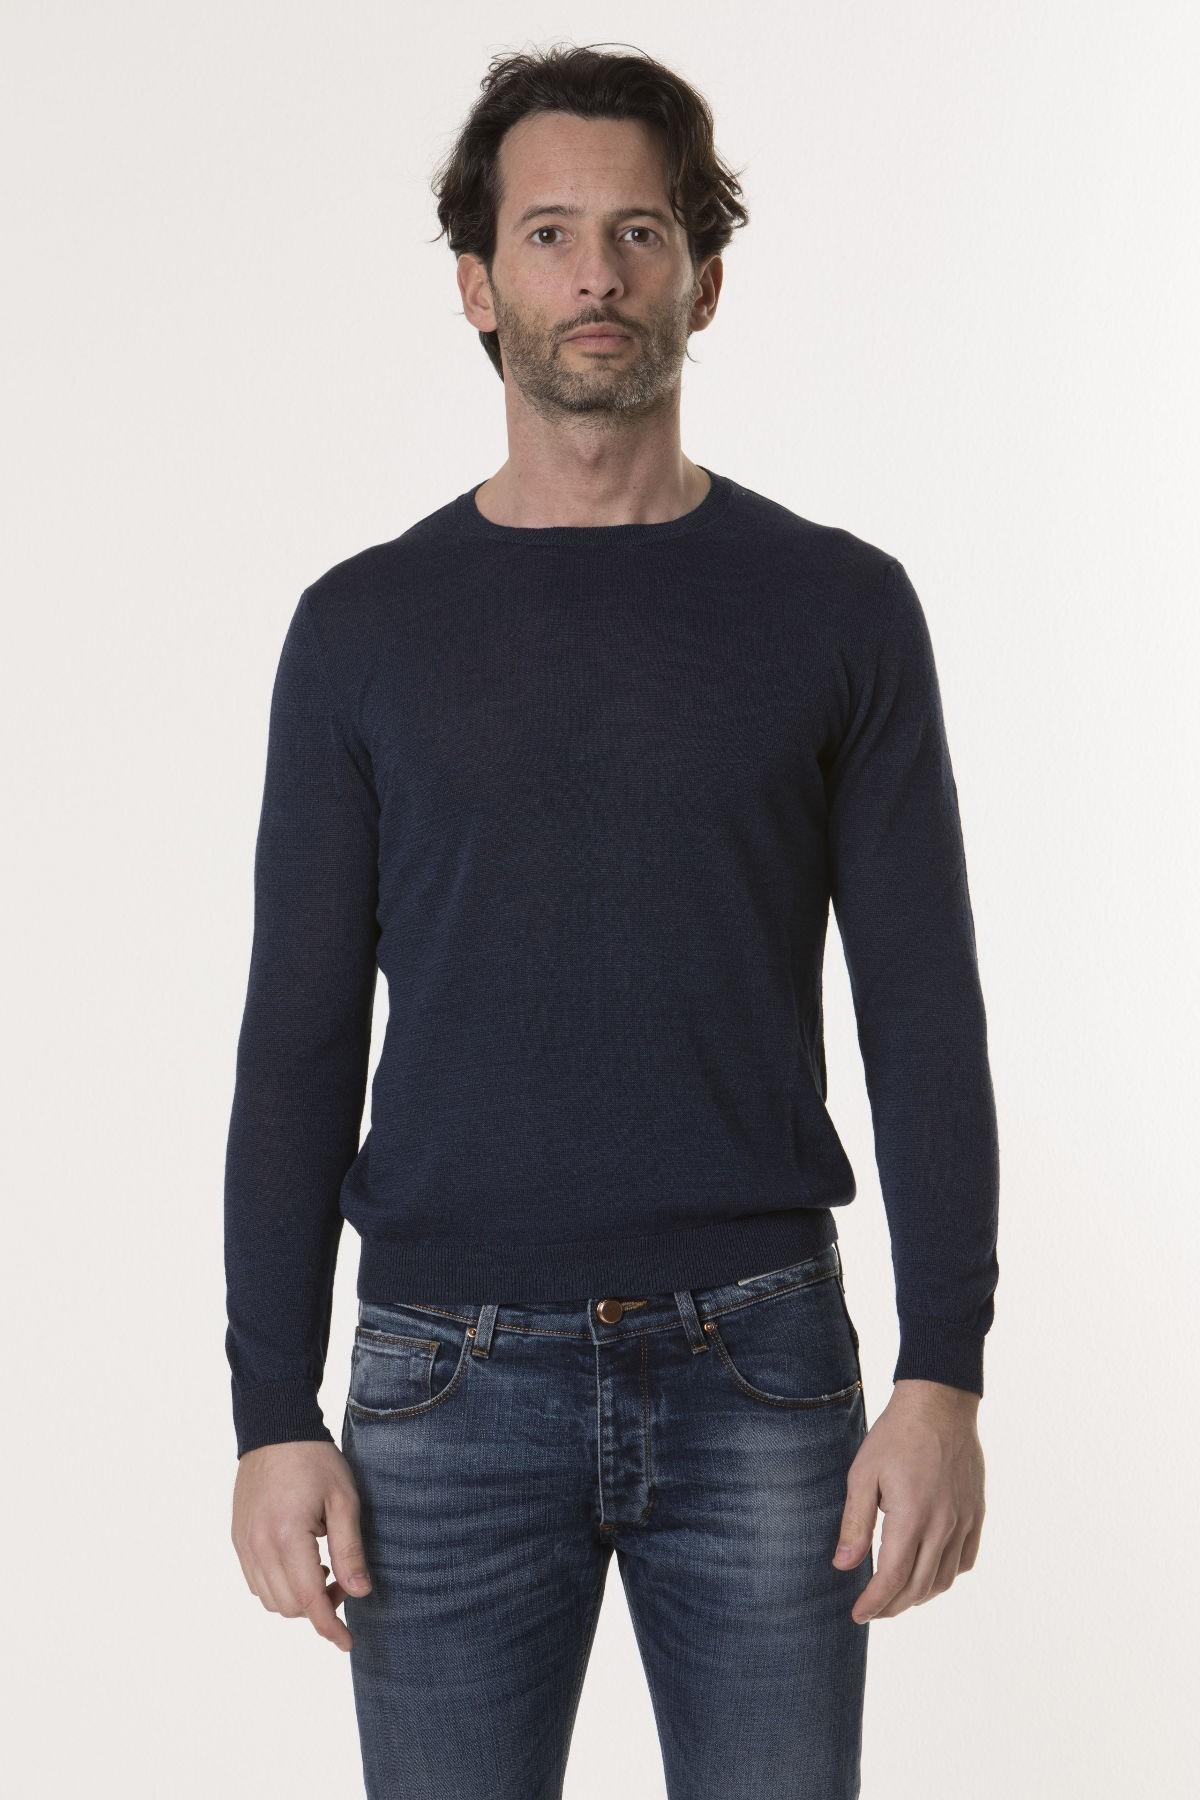 Pullover for man CIRCOLO 1901 S/S 18